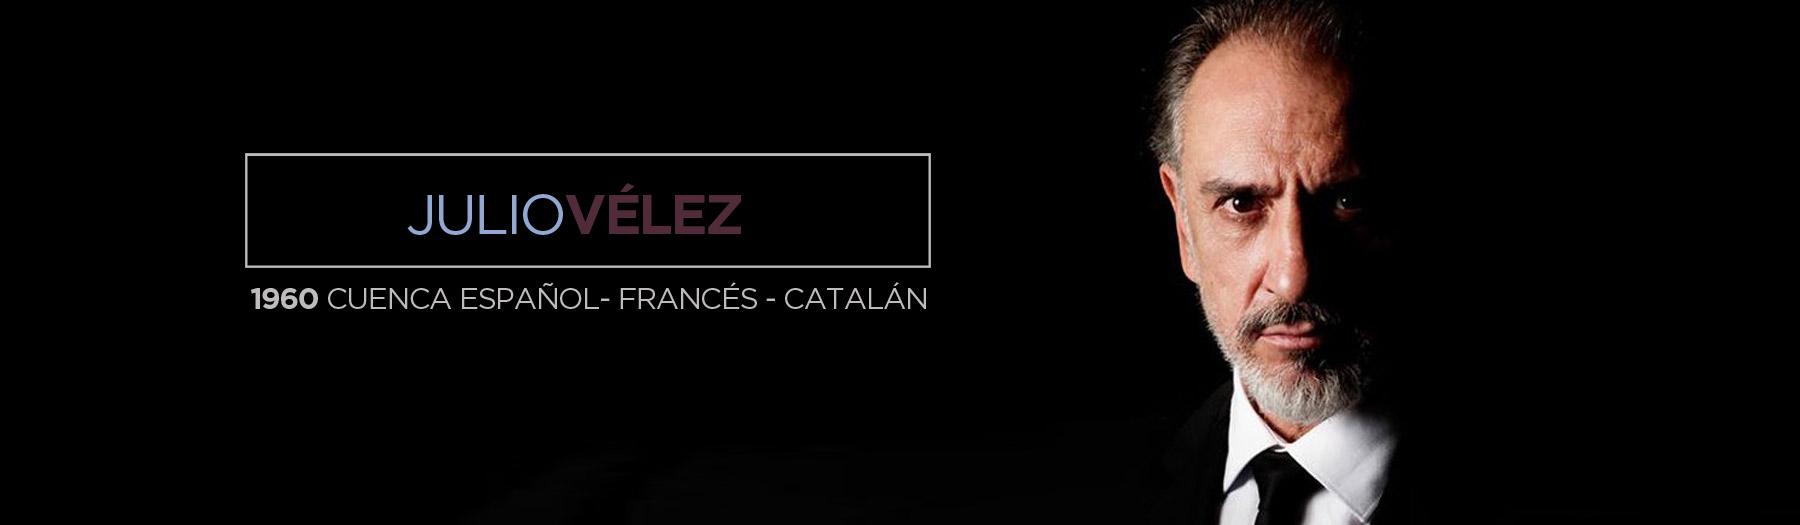 Julio Vélez Actor currículum | Marco Gadei Talent Agent